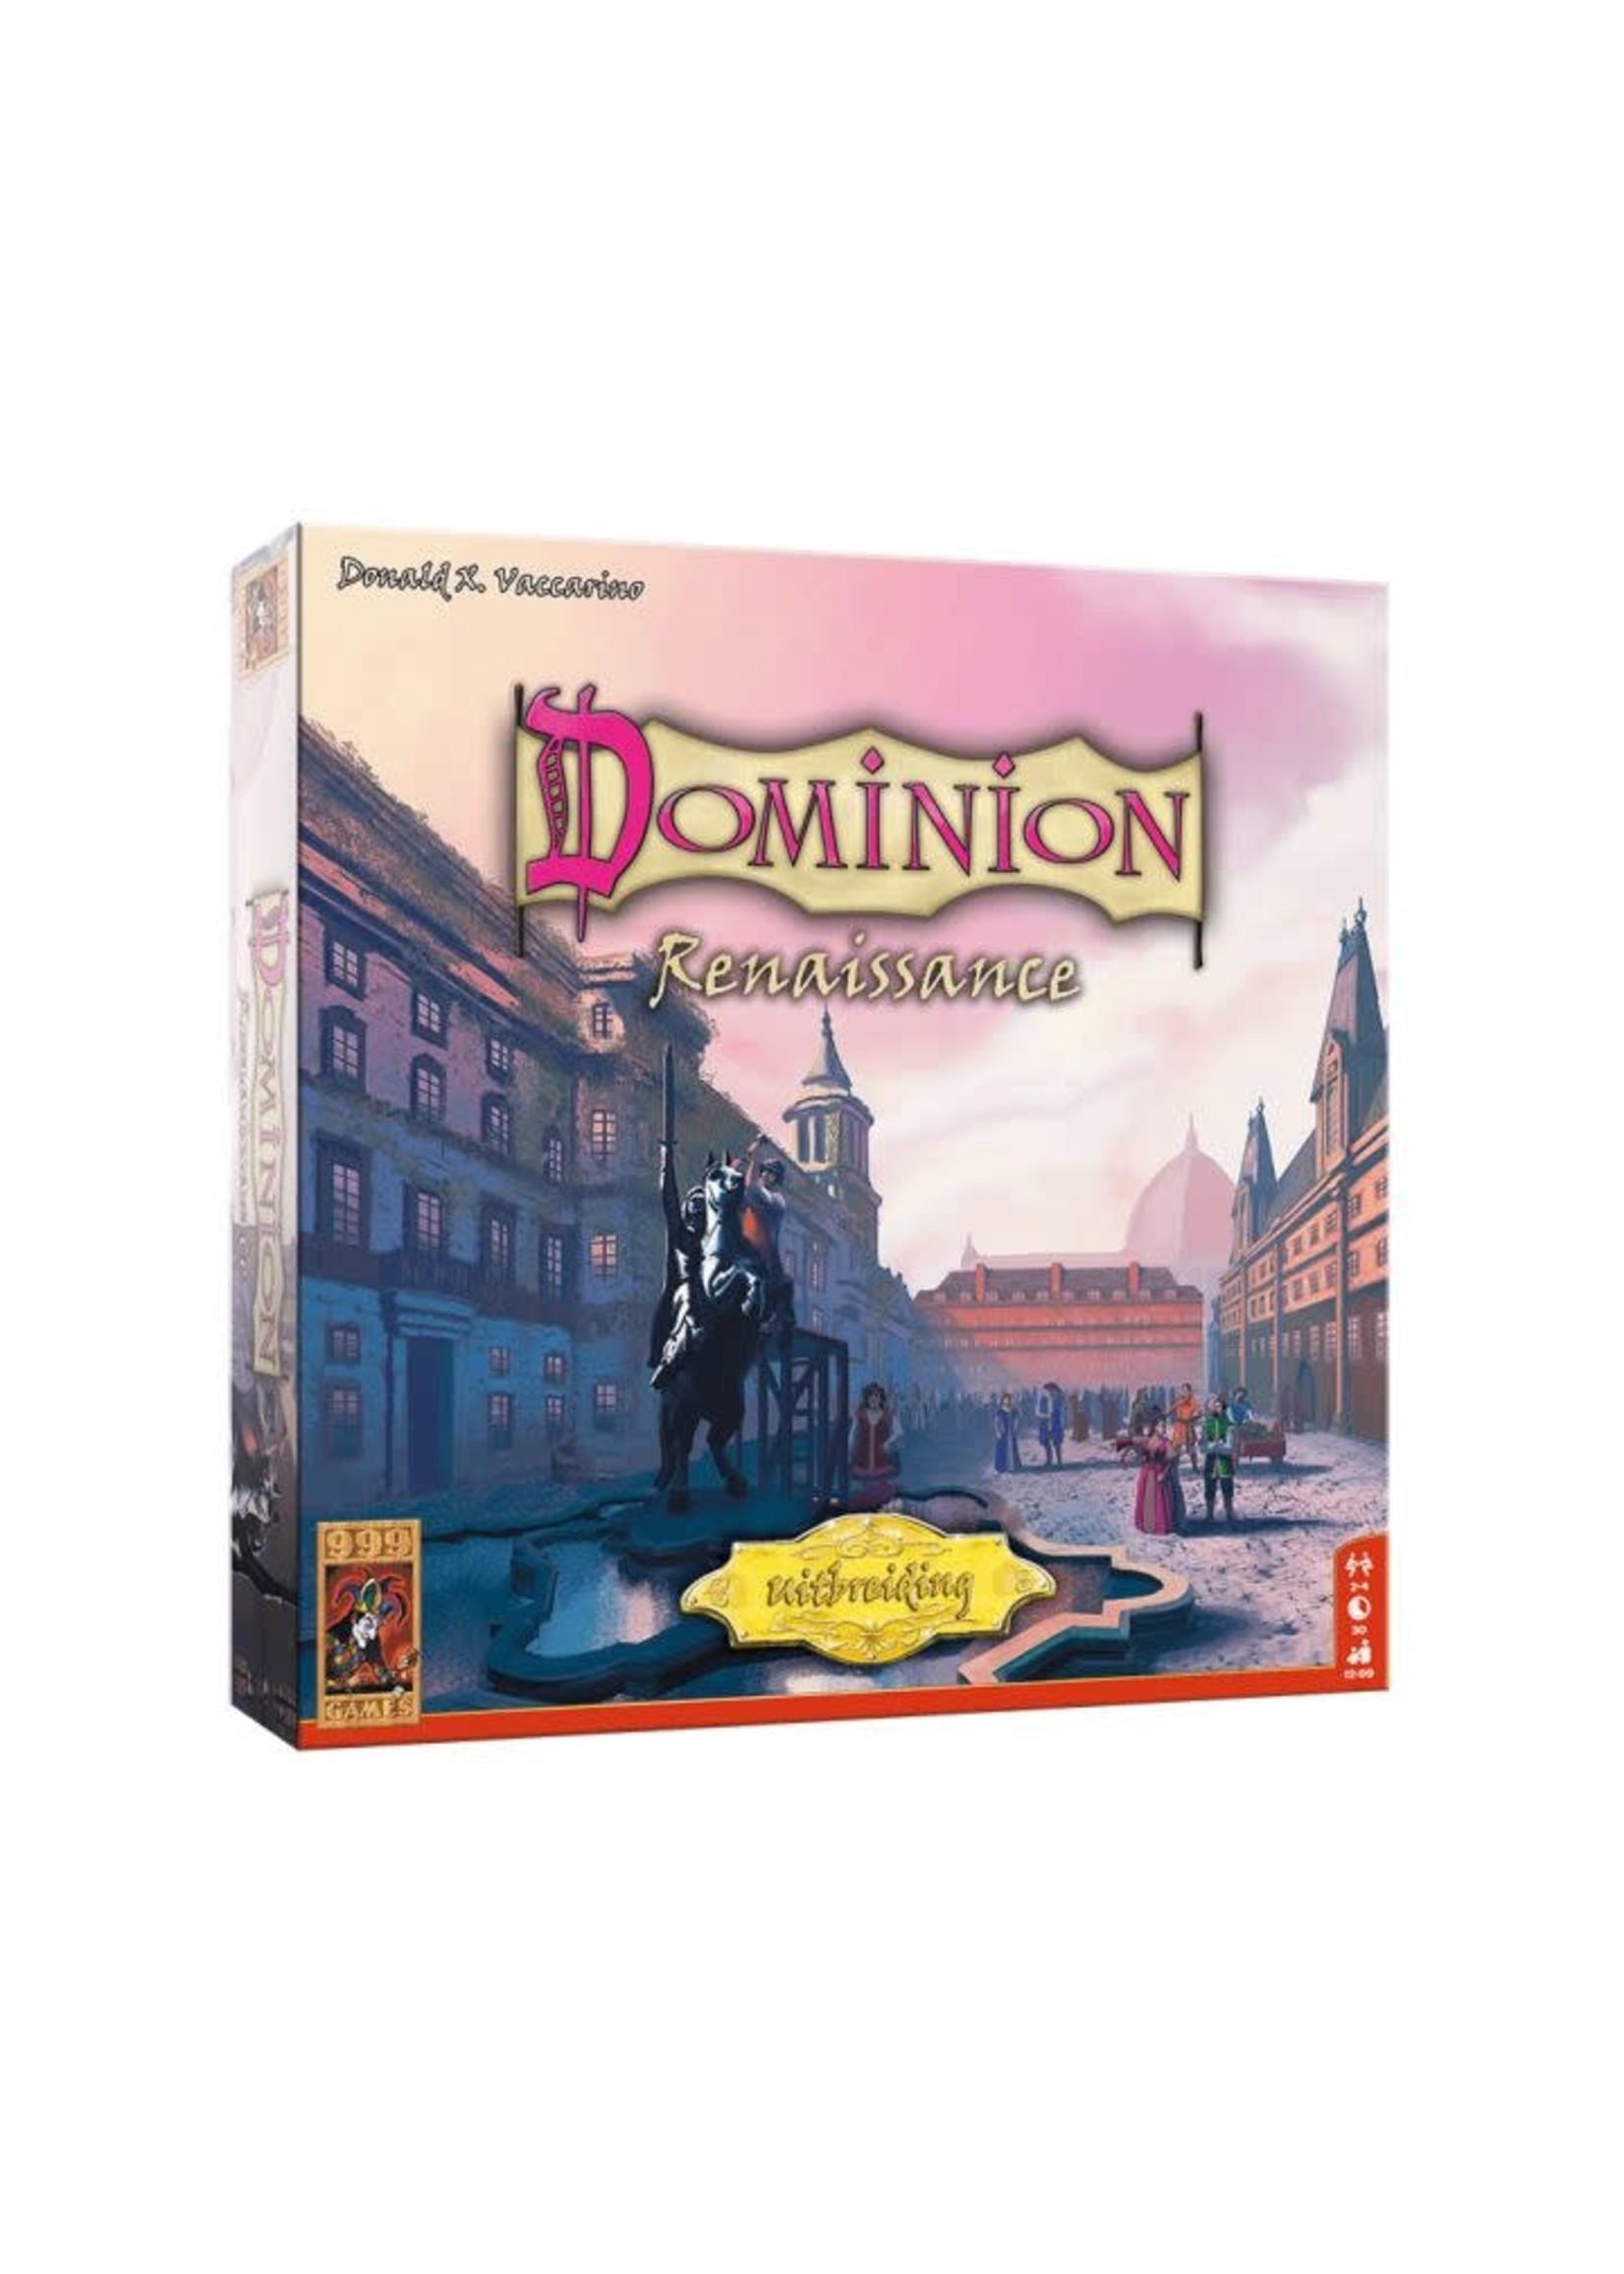 Dominion Rennaissance